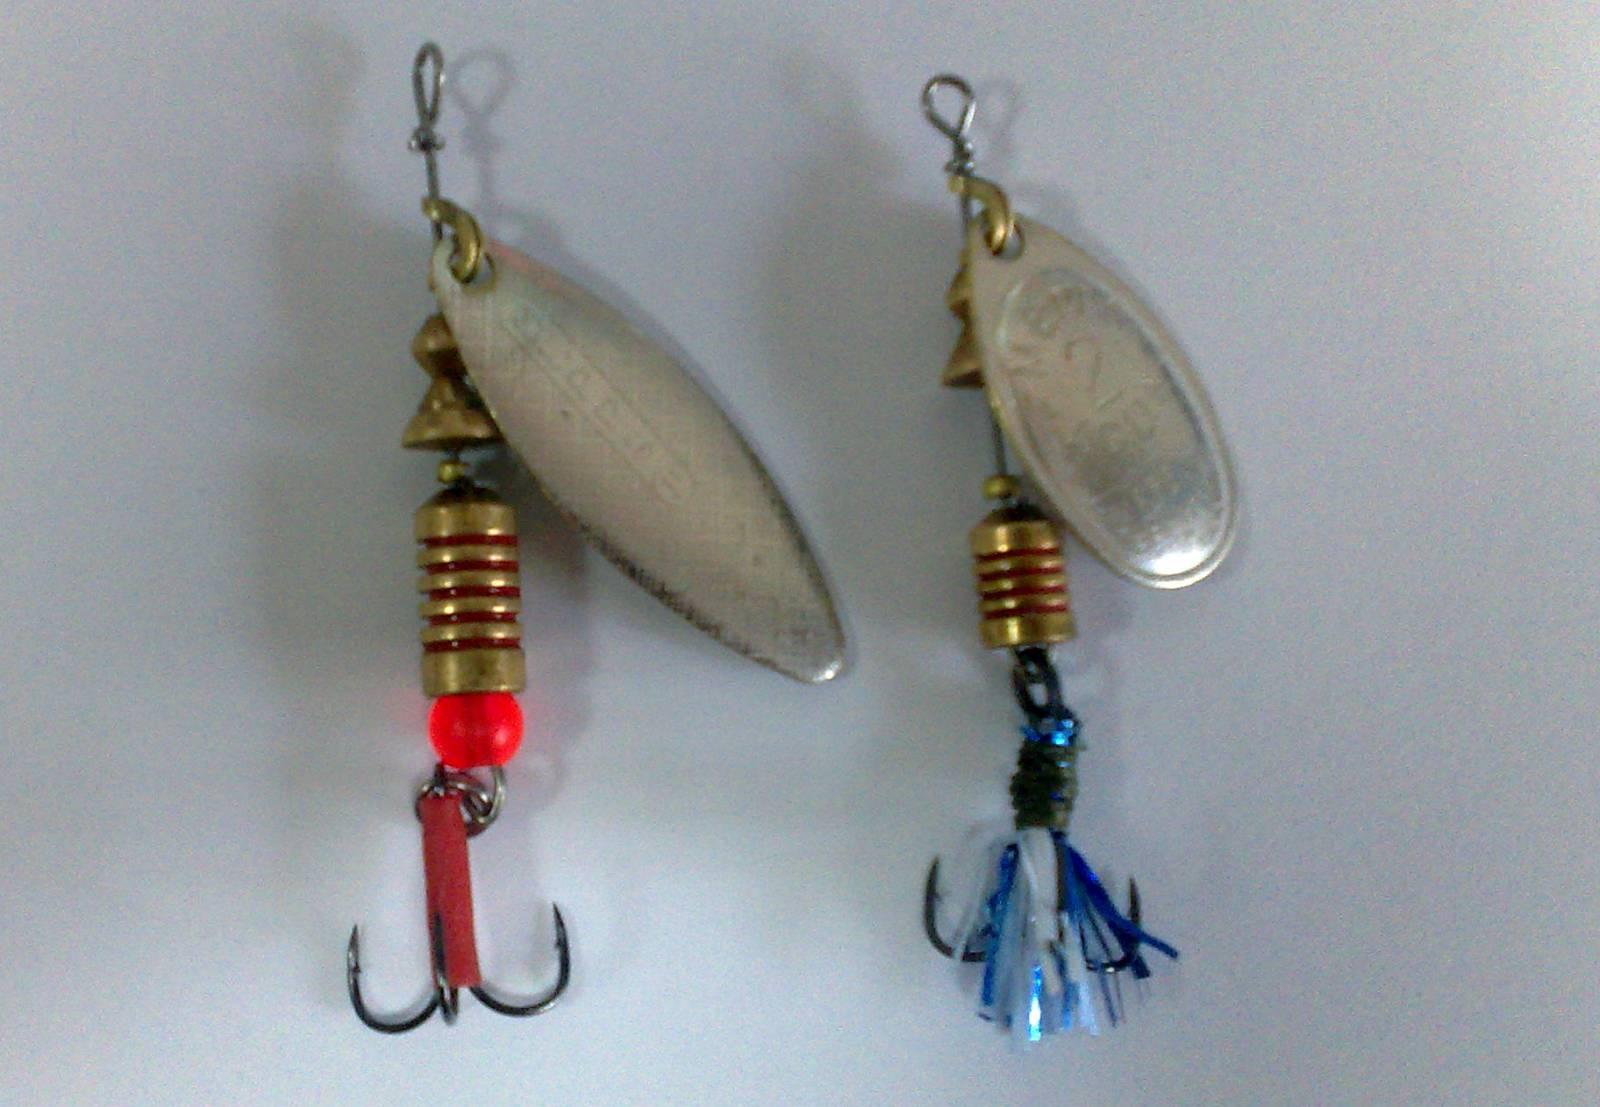 Рыболовн пр иманки своими руками